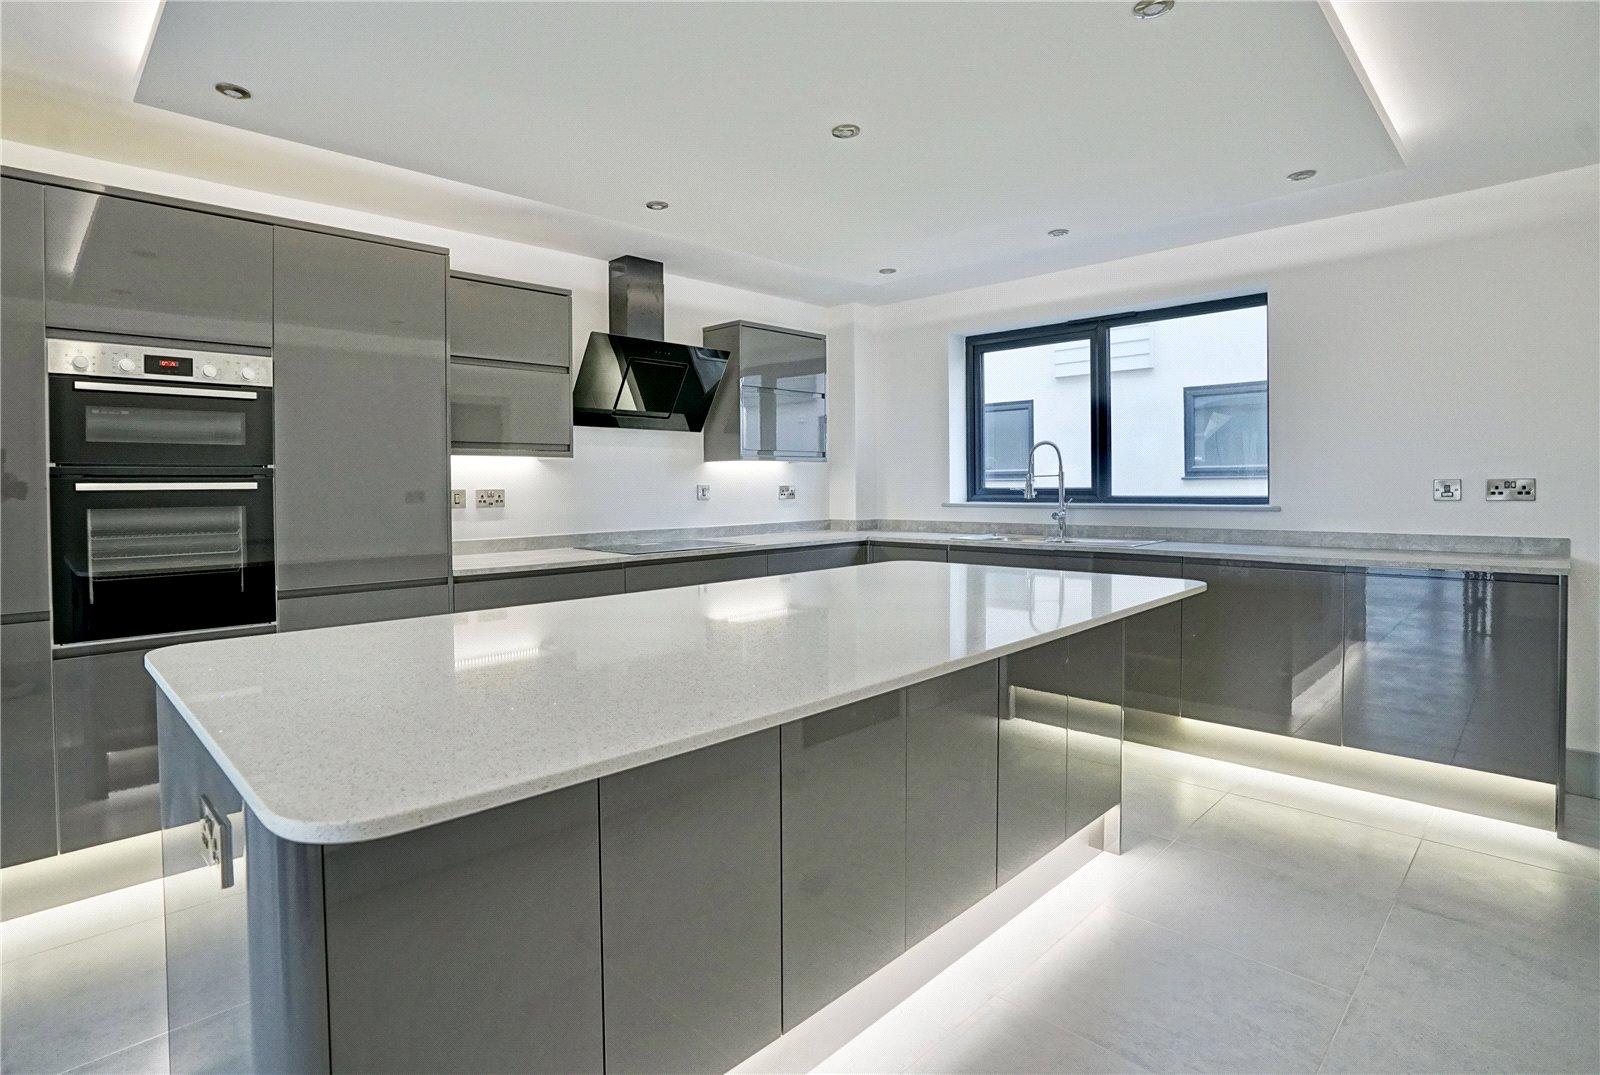 5 bed house for sale in The Range, Eynesbury Hardwicke - Property Image 1